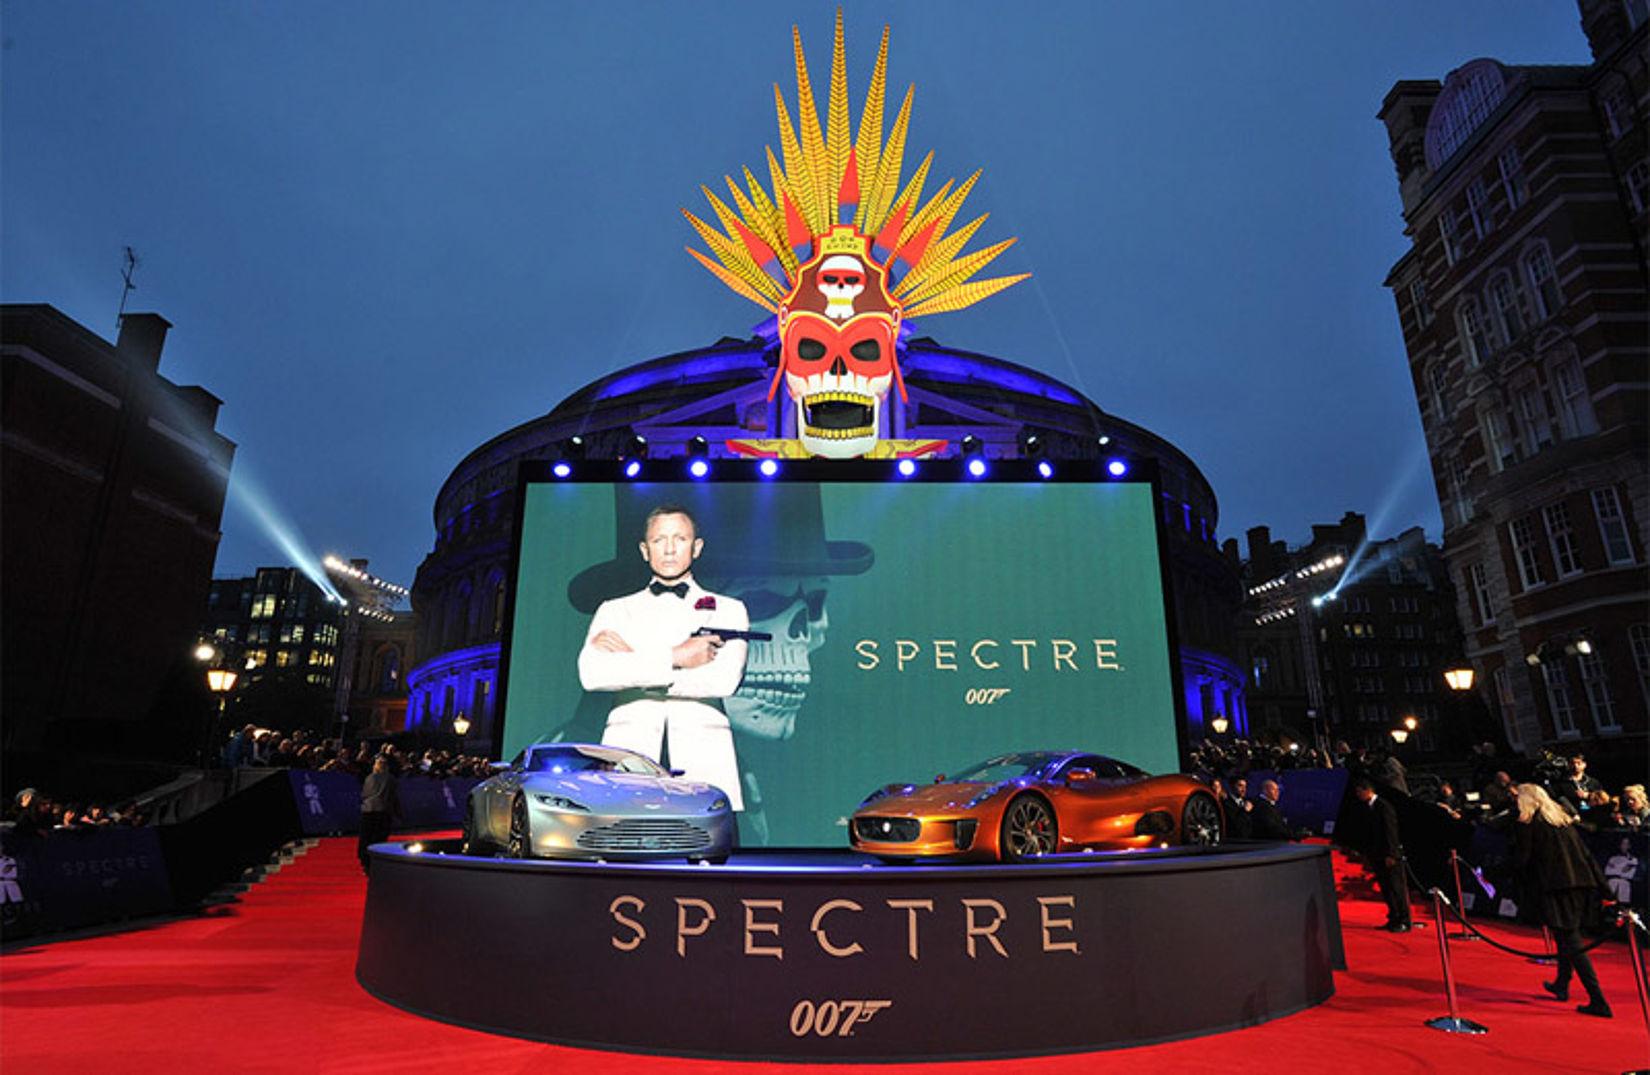 Spectre Cinemaxx